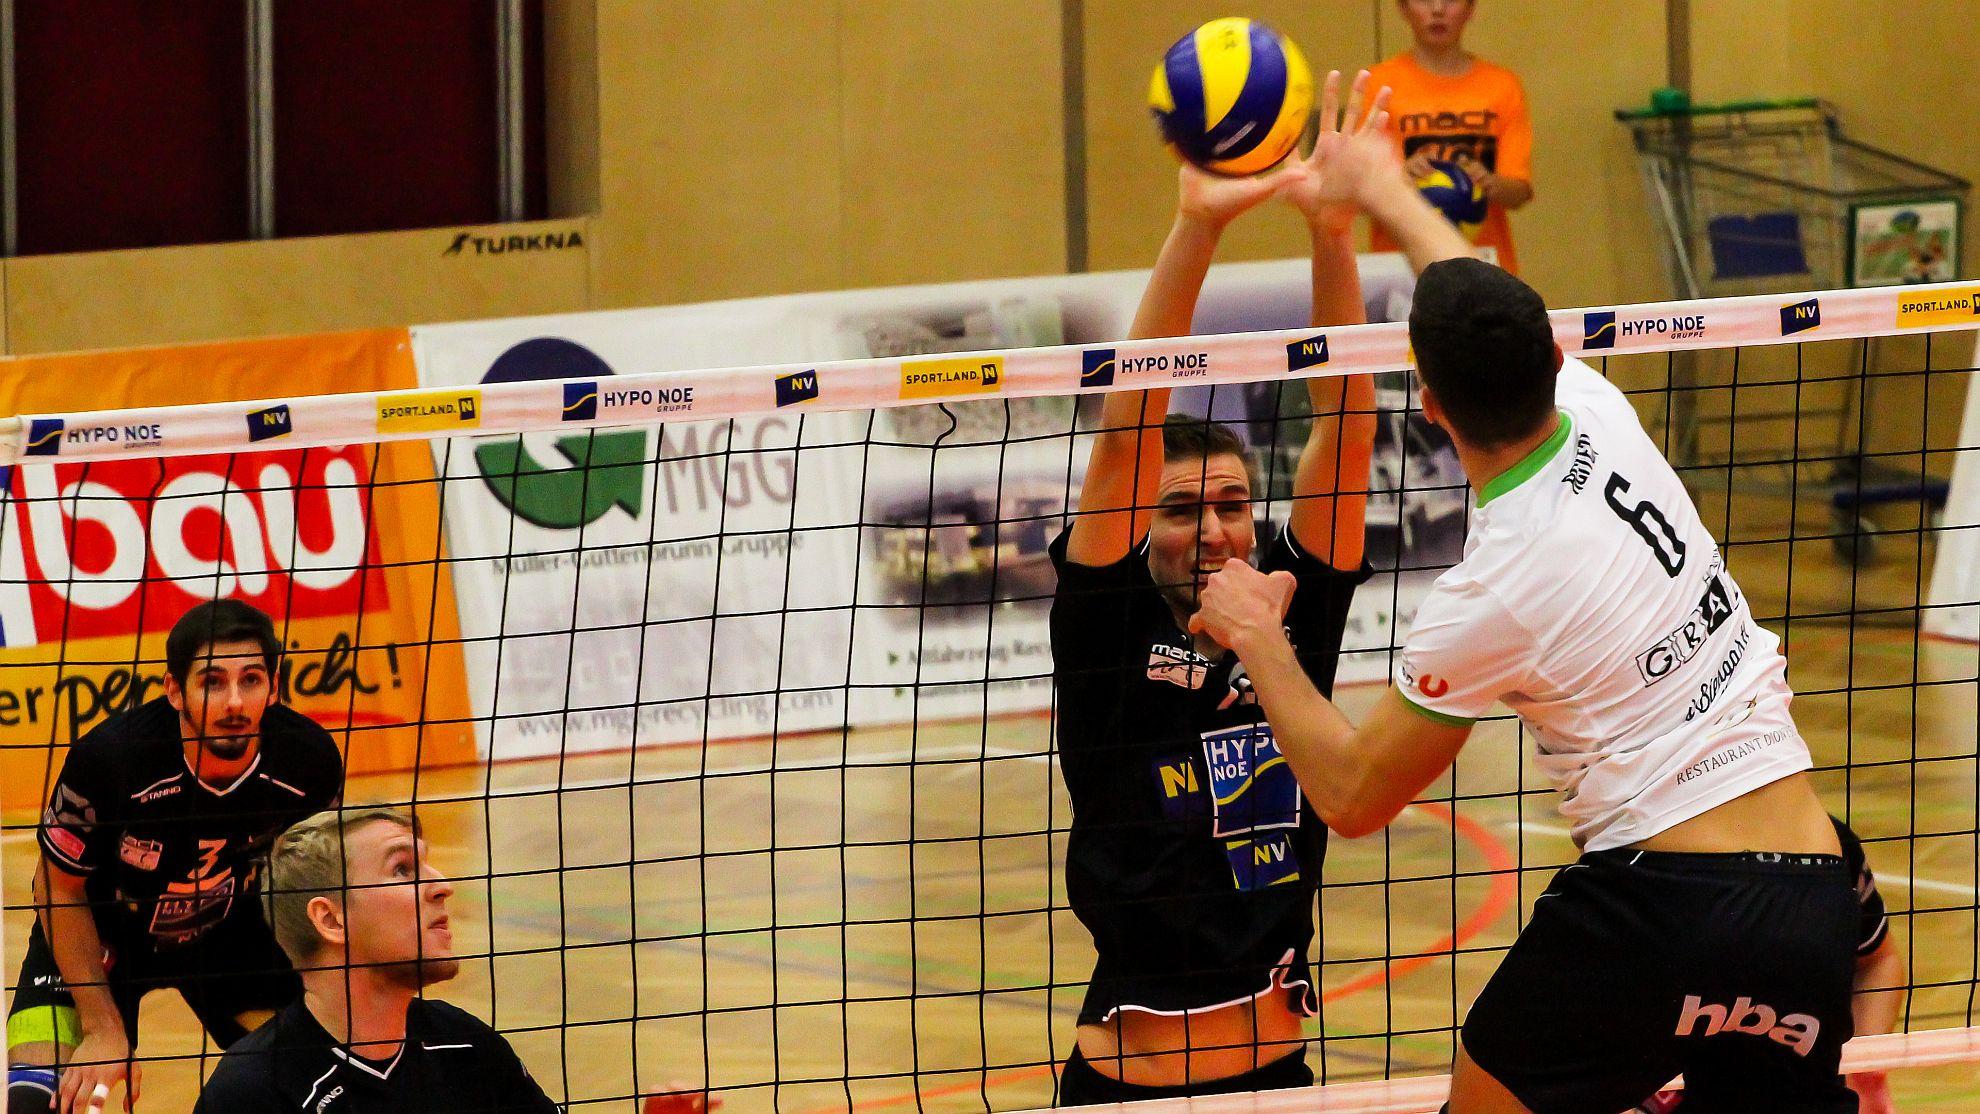 DenizBank AG Volley League Men 2017/18: SG VCA Amstetten NÖ/hotVolleys vs. UVC Holding Graz - FOTO © Peter Maurer